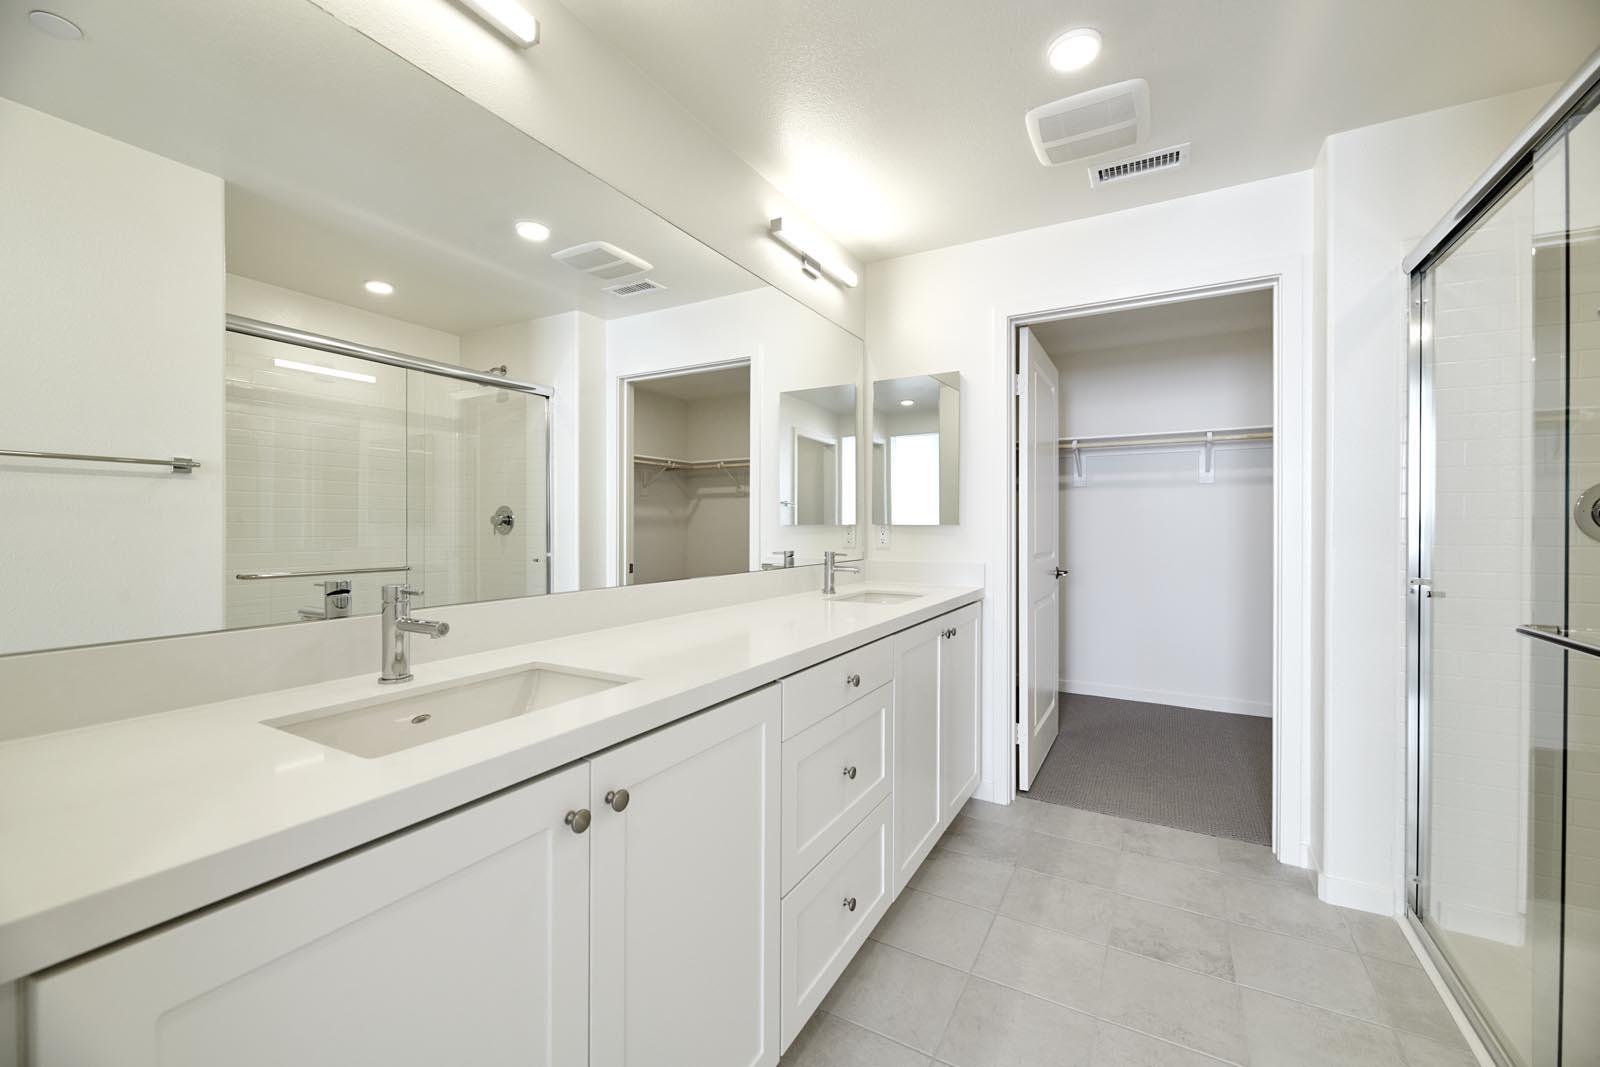 Master Bathroom | Residence 2 | Aspire | New Homes in Rancho Cucamonga, CA | Van Daele Homes